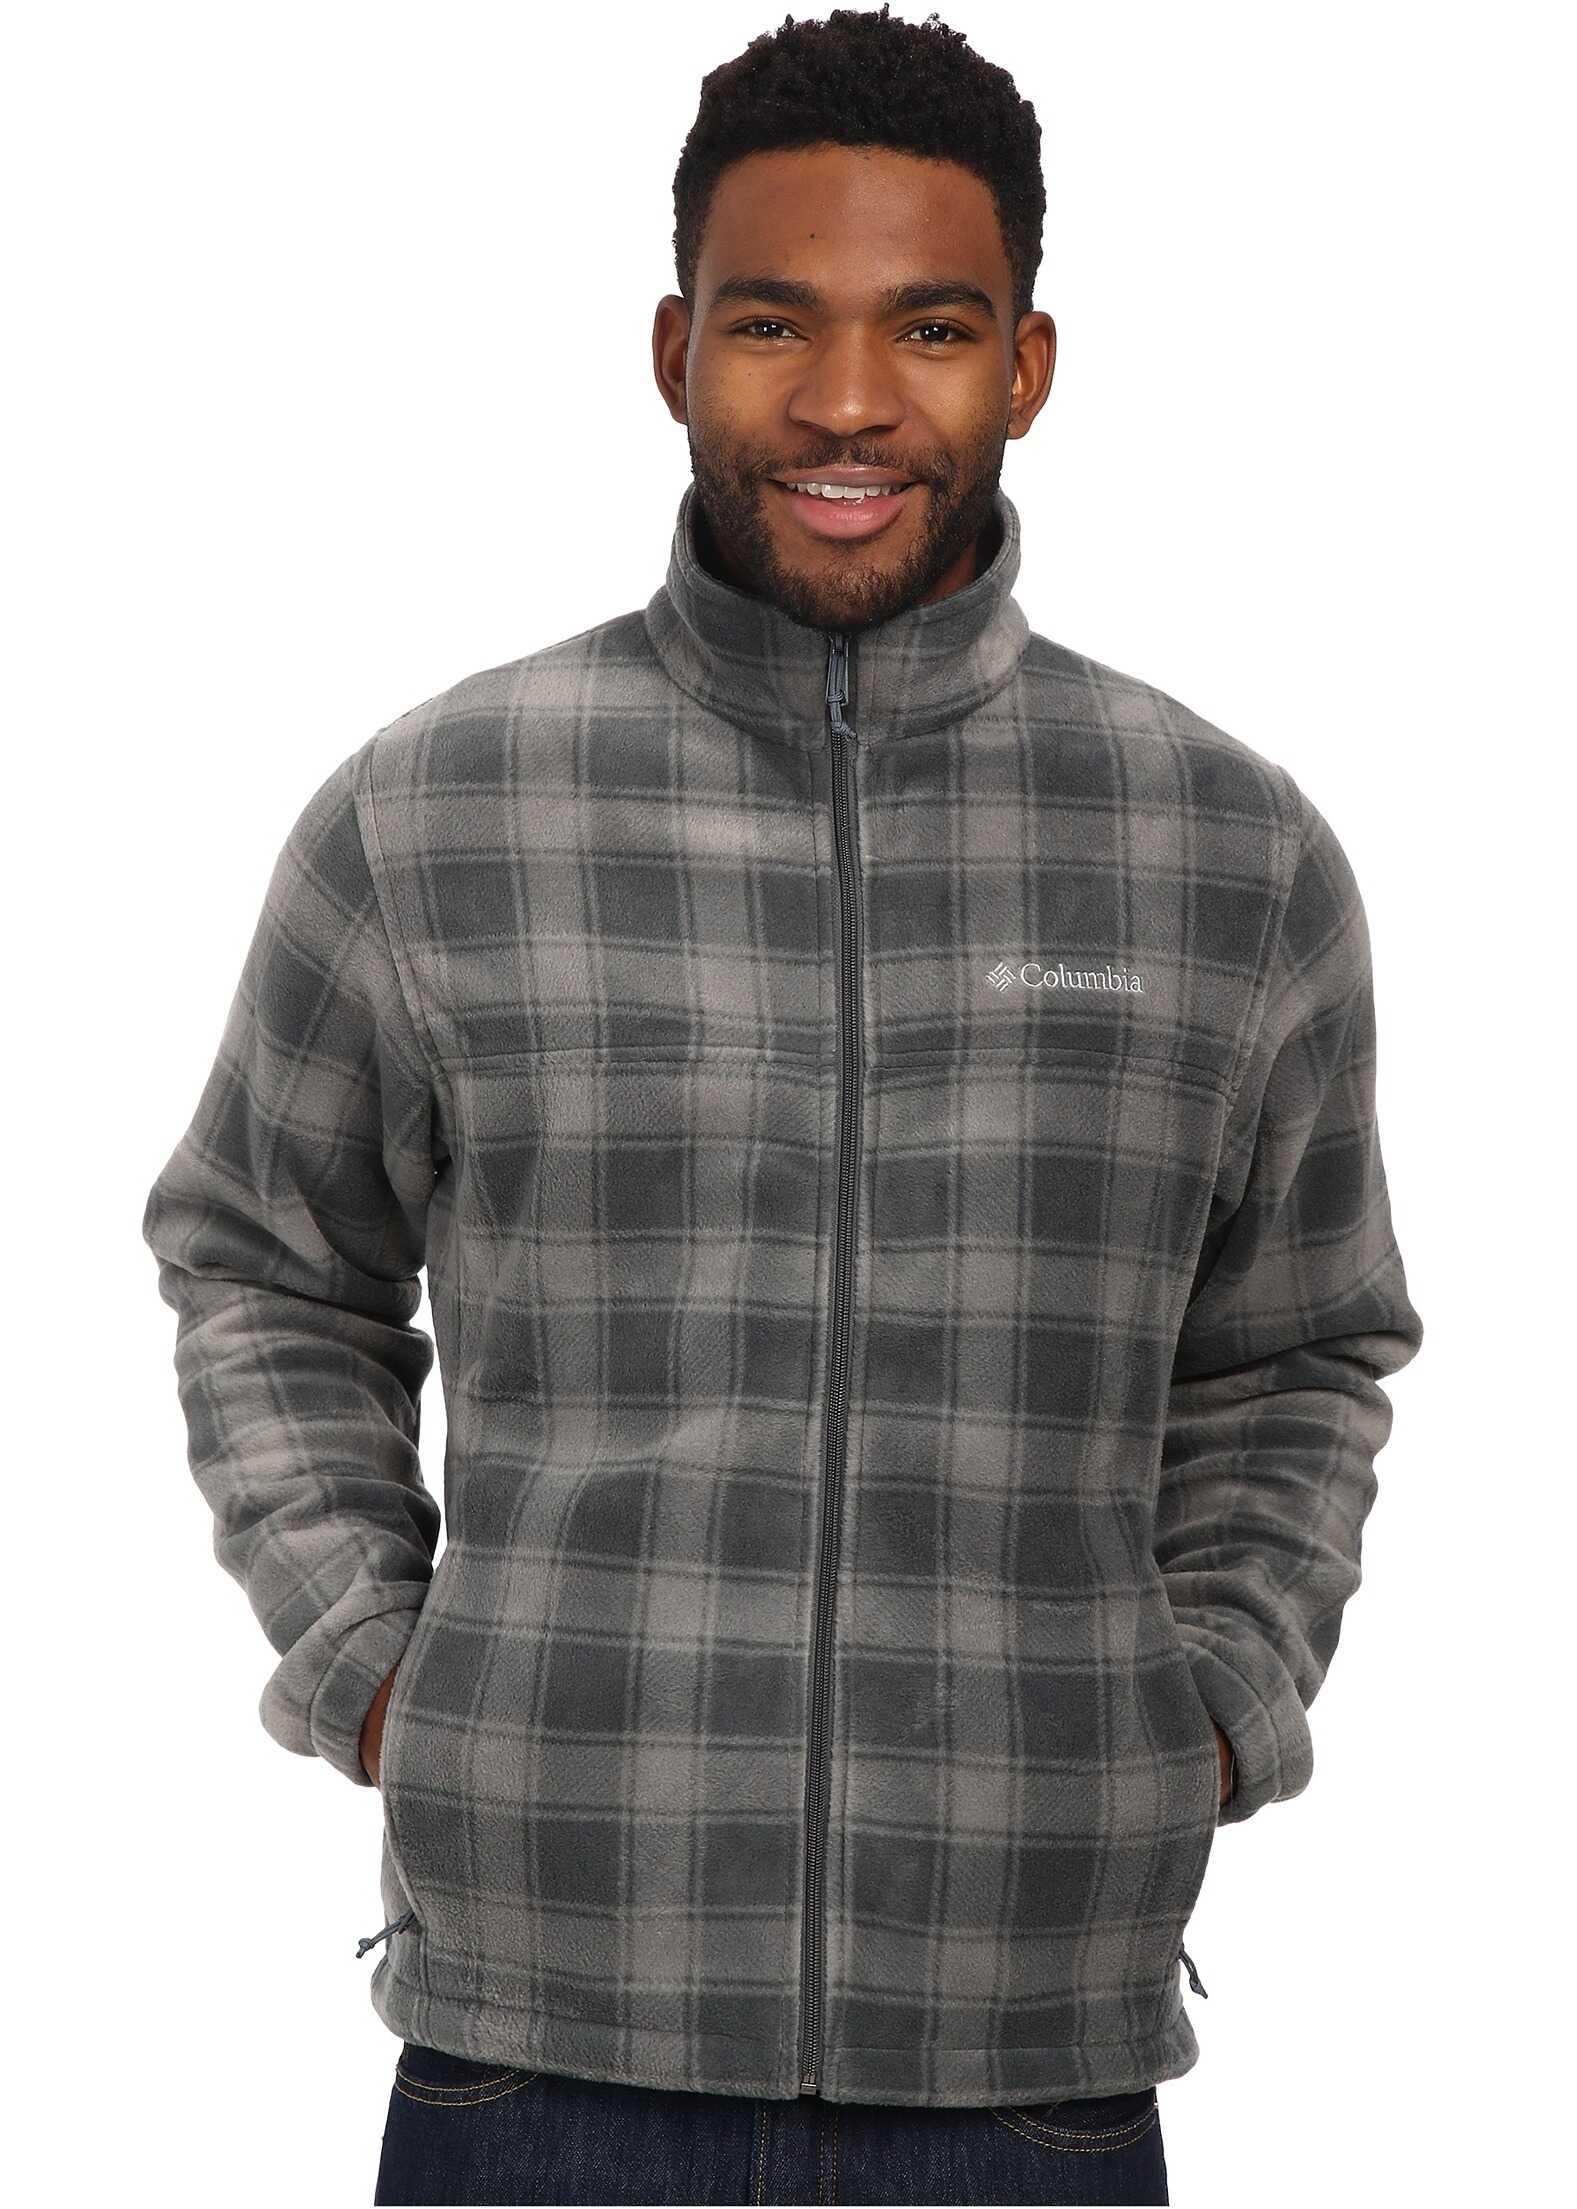 Columbia Steens Mountain™ Print Jacket Graphite Lumberjack